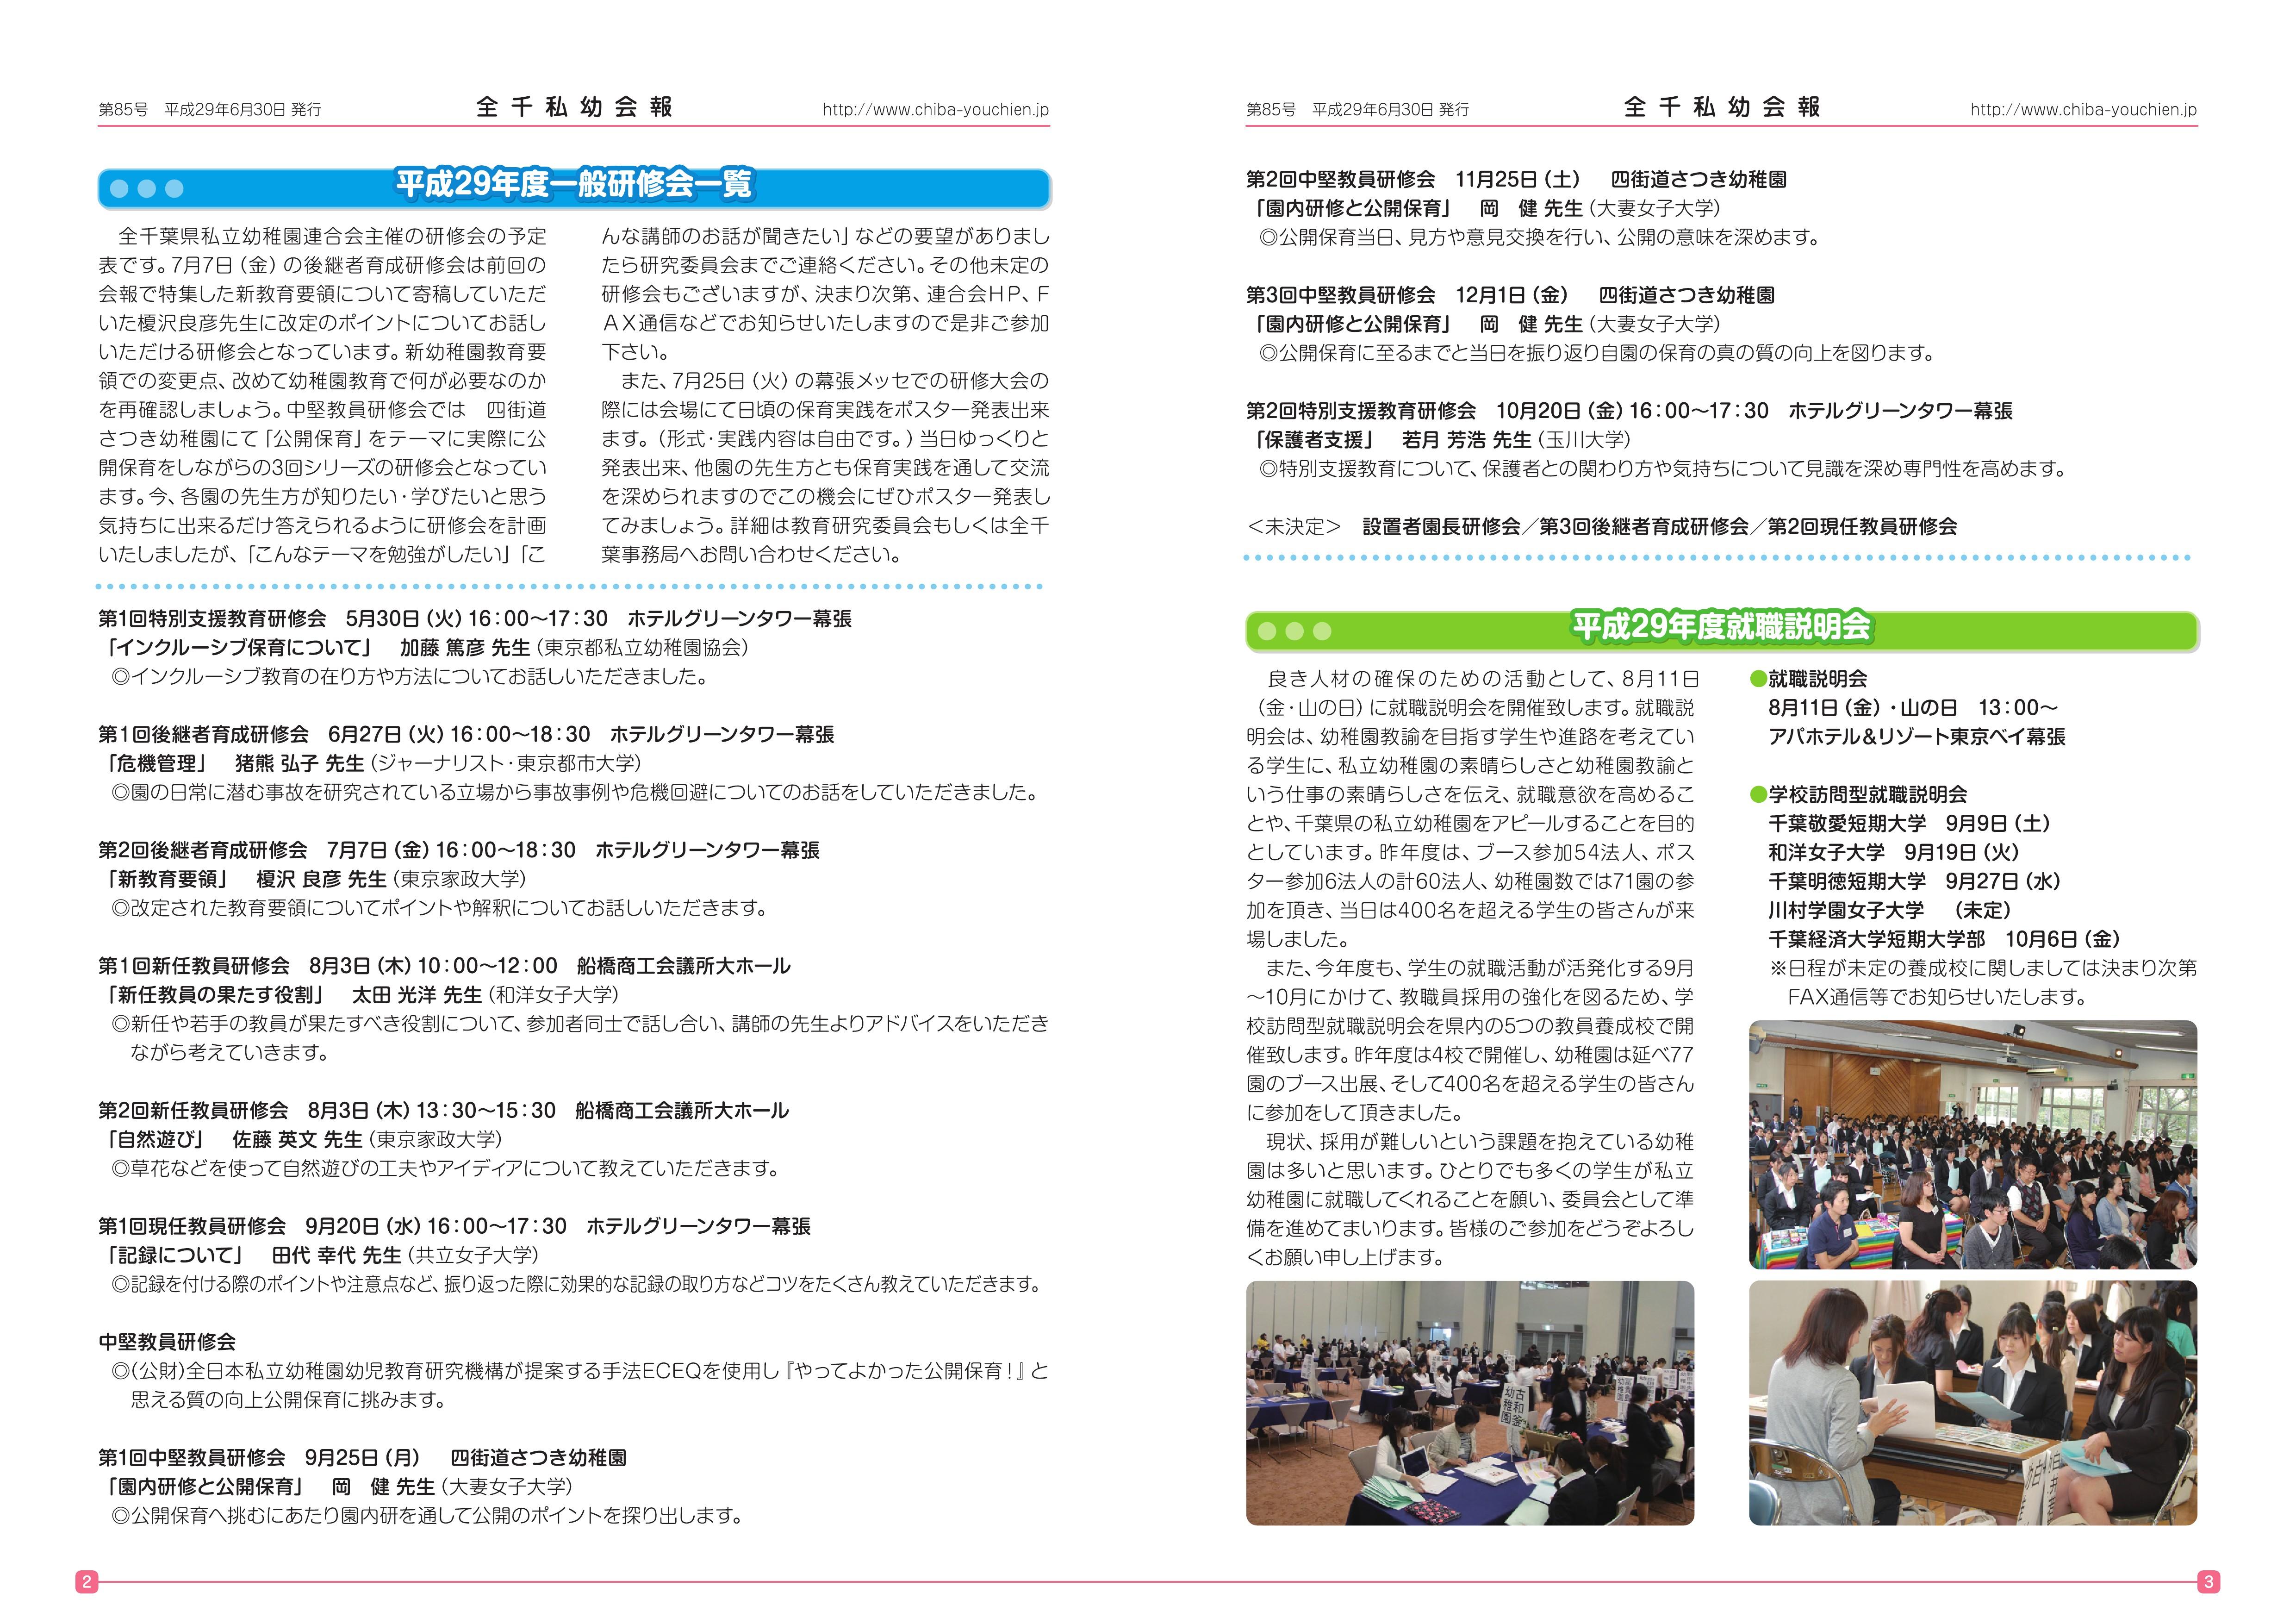 http://www.chiba-youchien.jp/news/85_P2_P3_0628.jpg